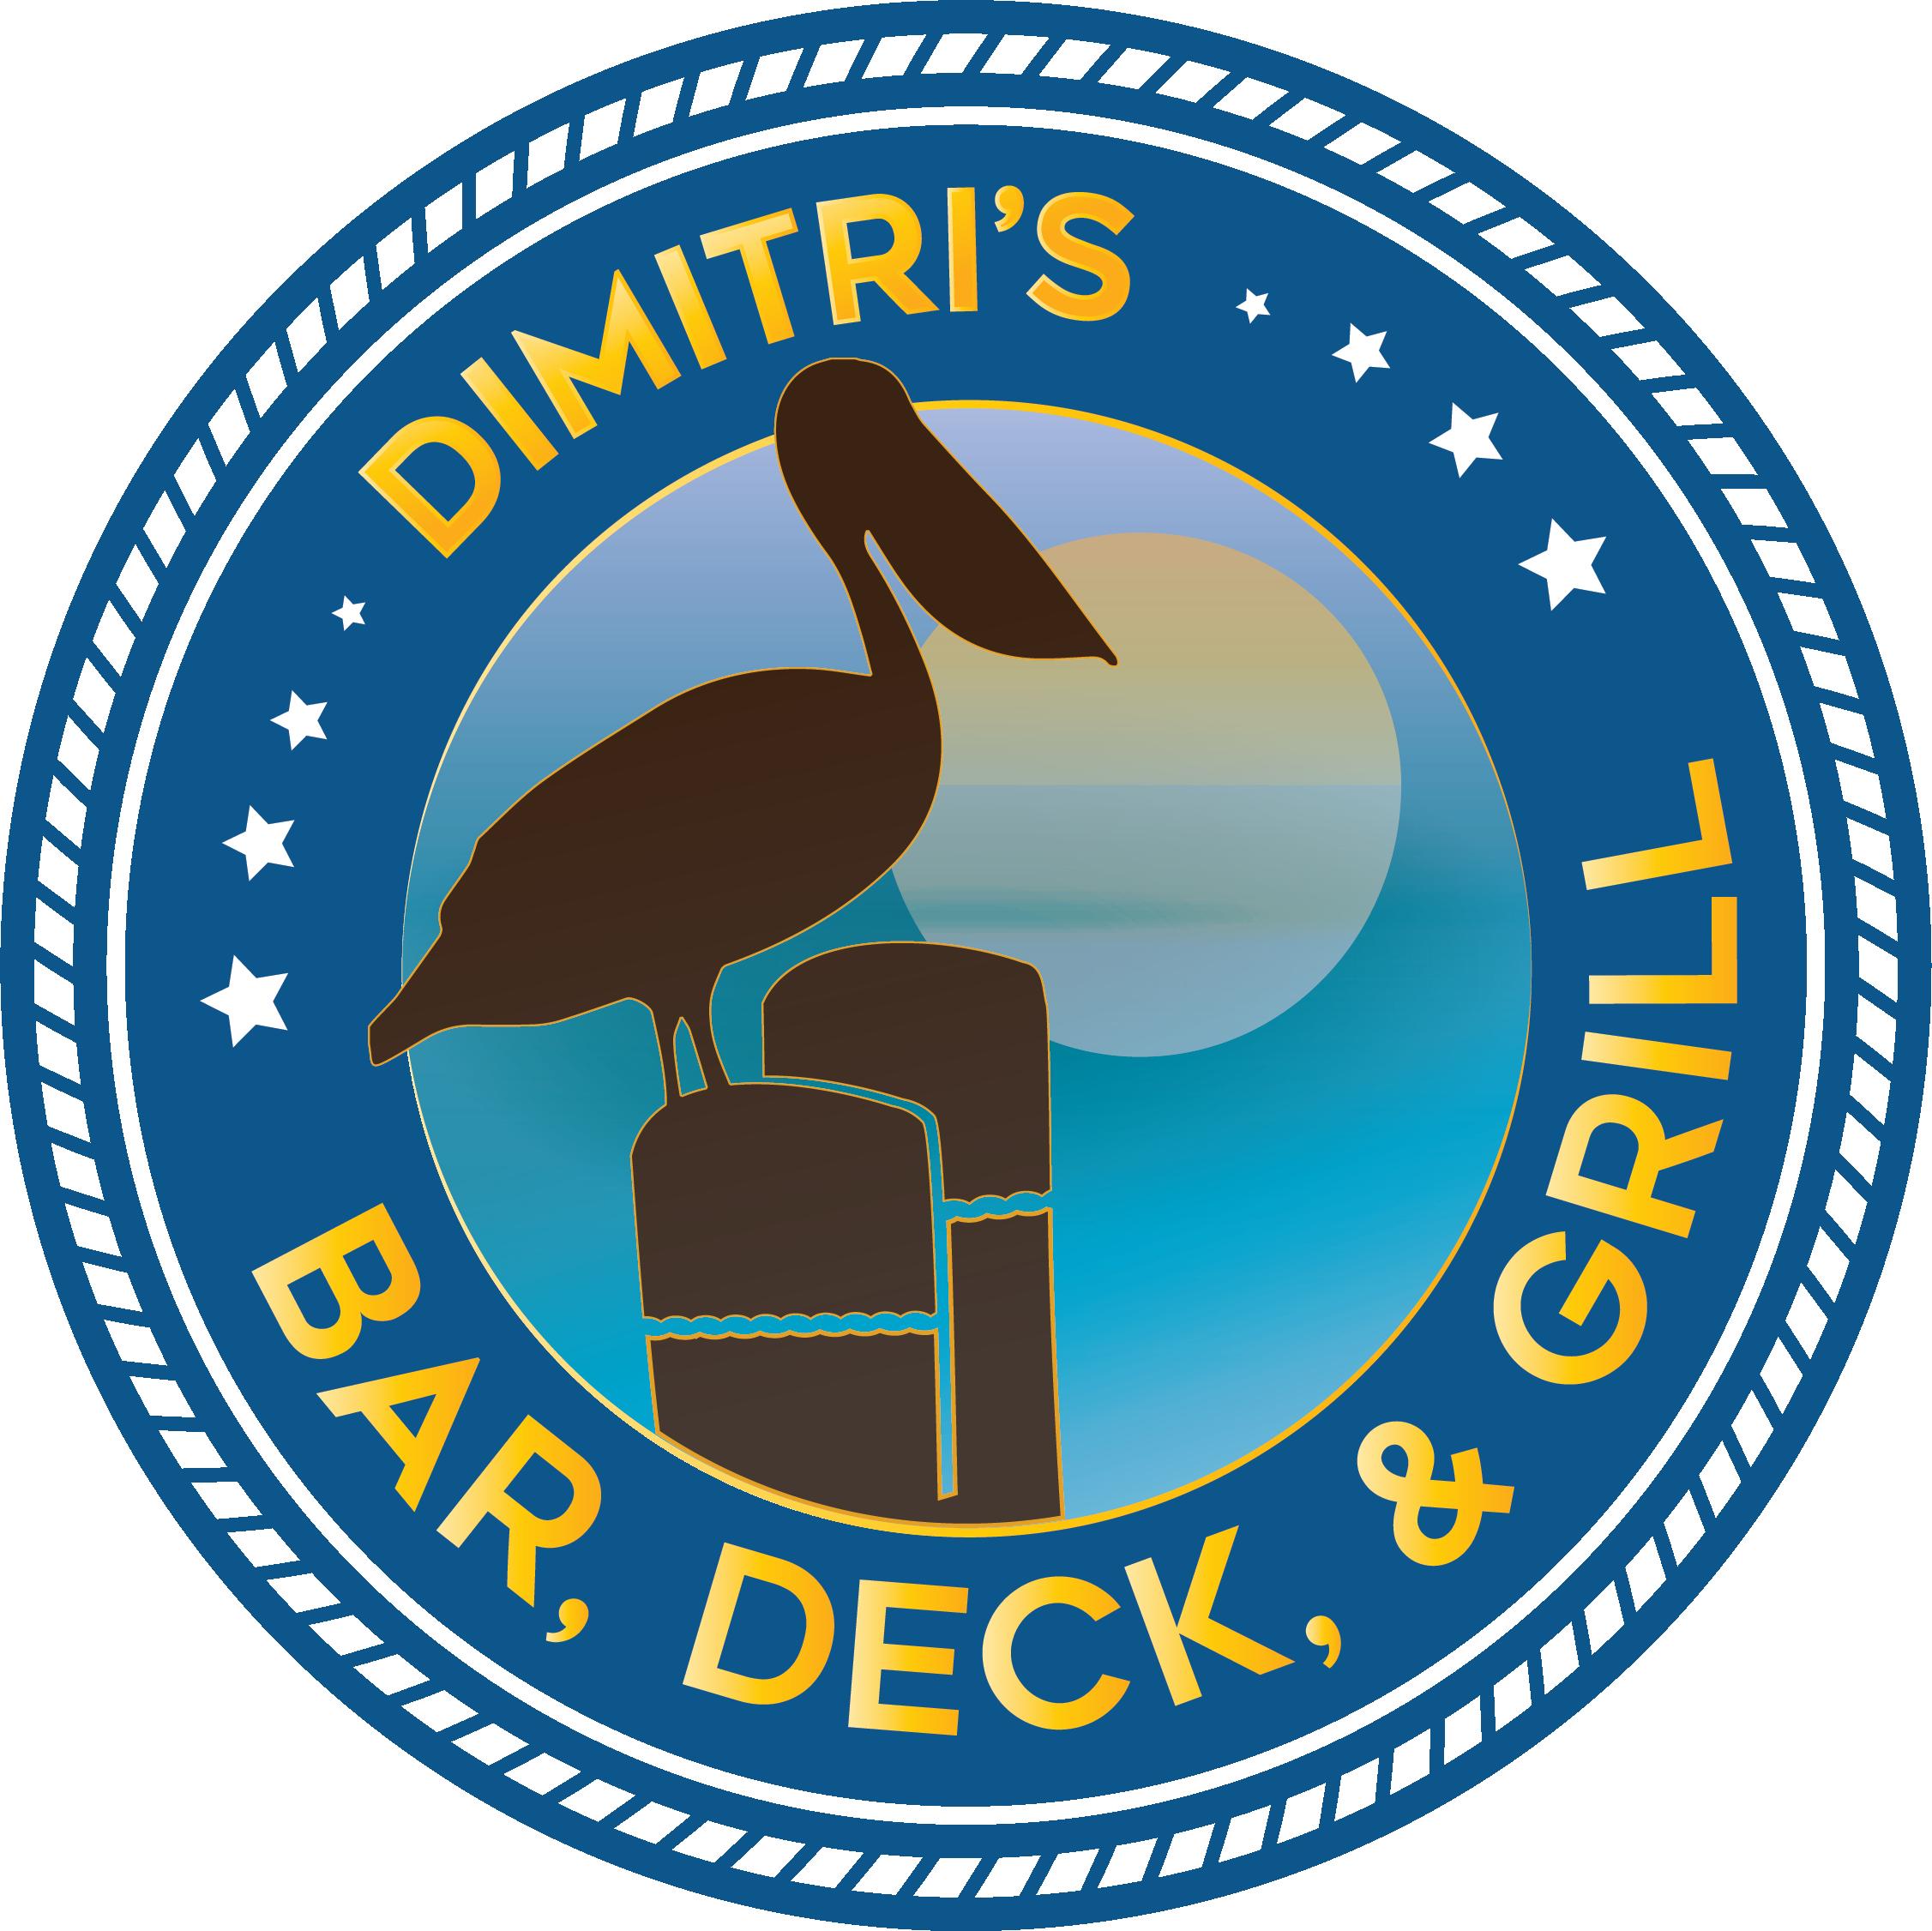 Pelican clipart fish. Dimitris bar deck and